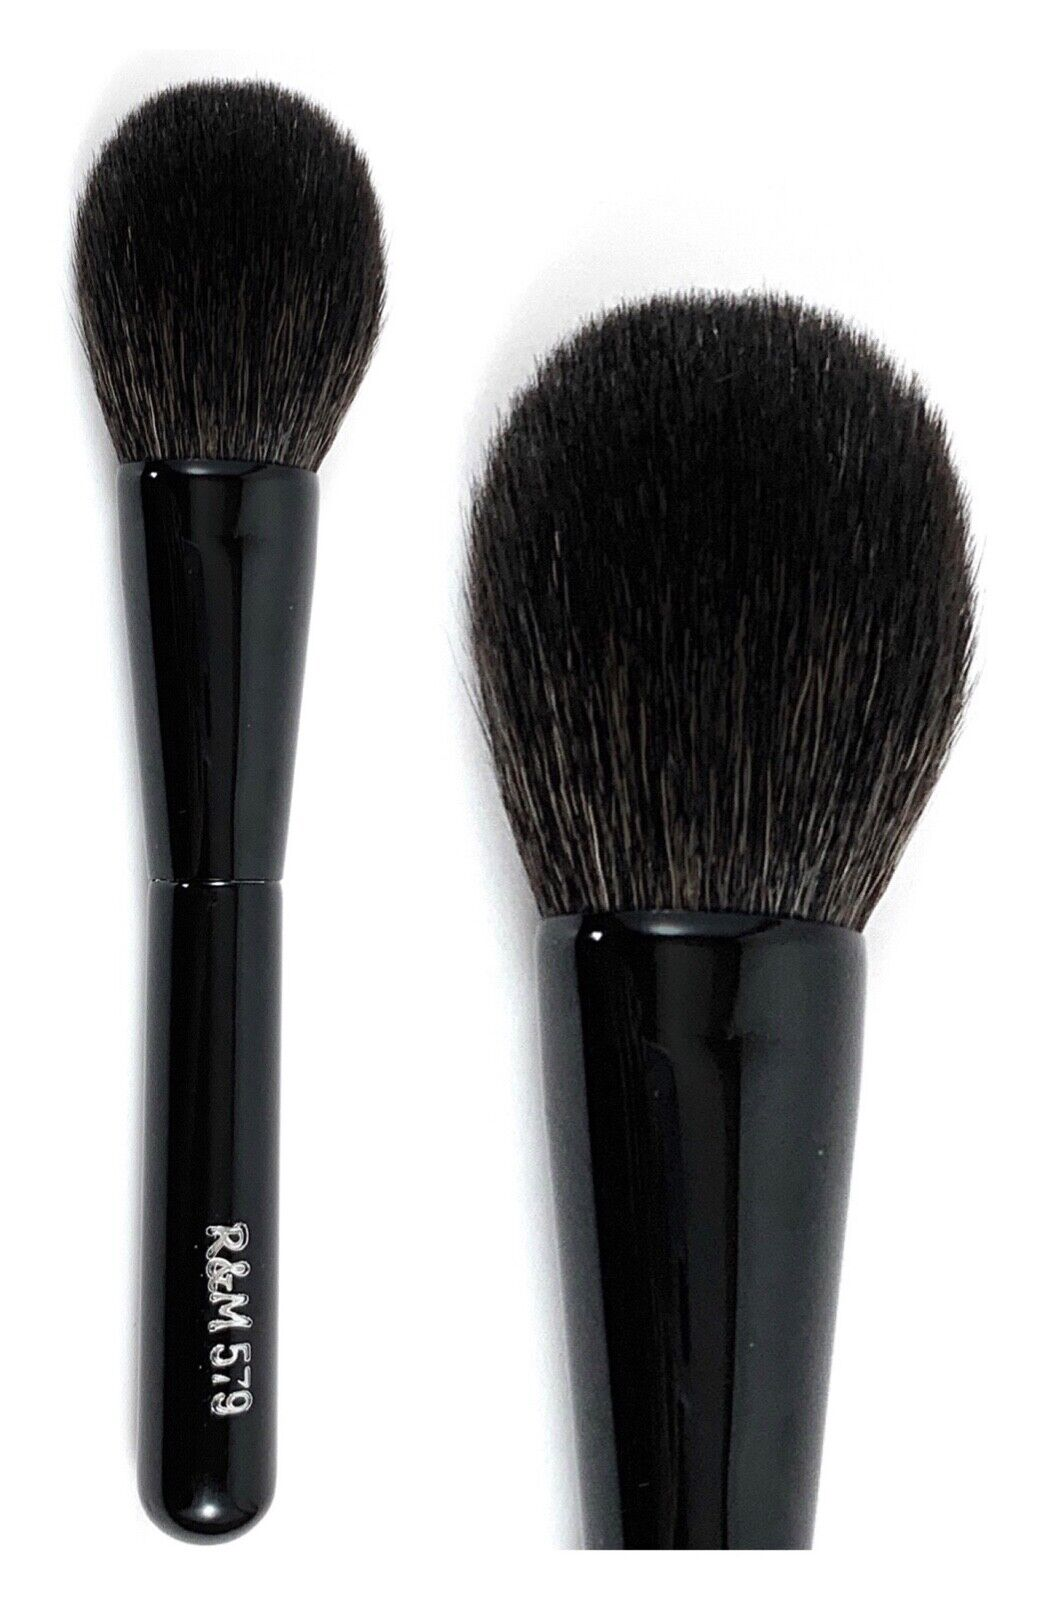 R&M 579 Powder brush